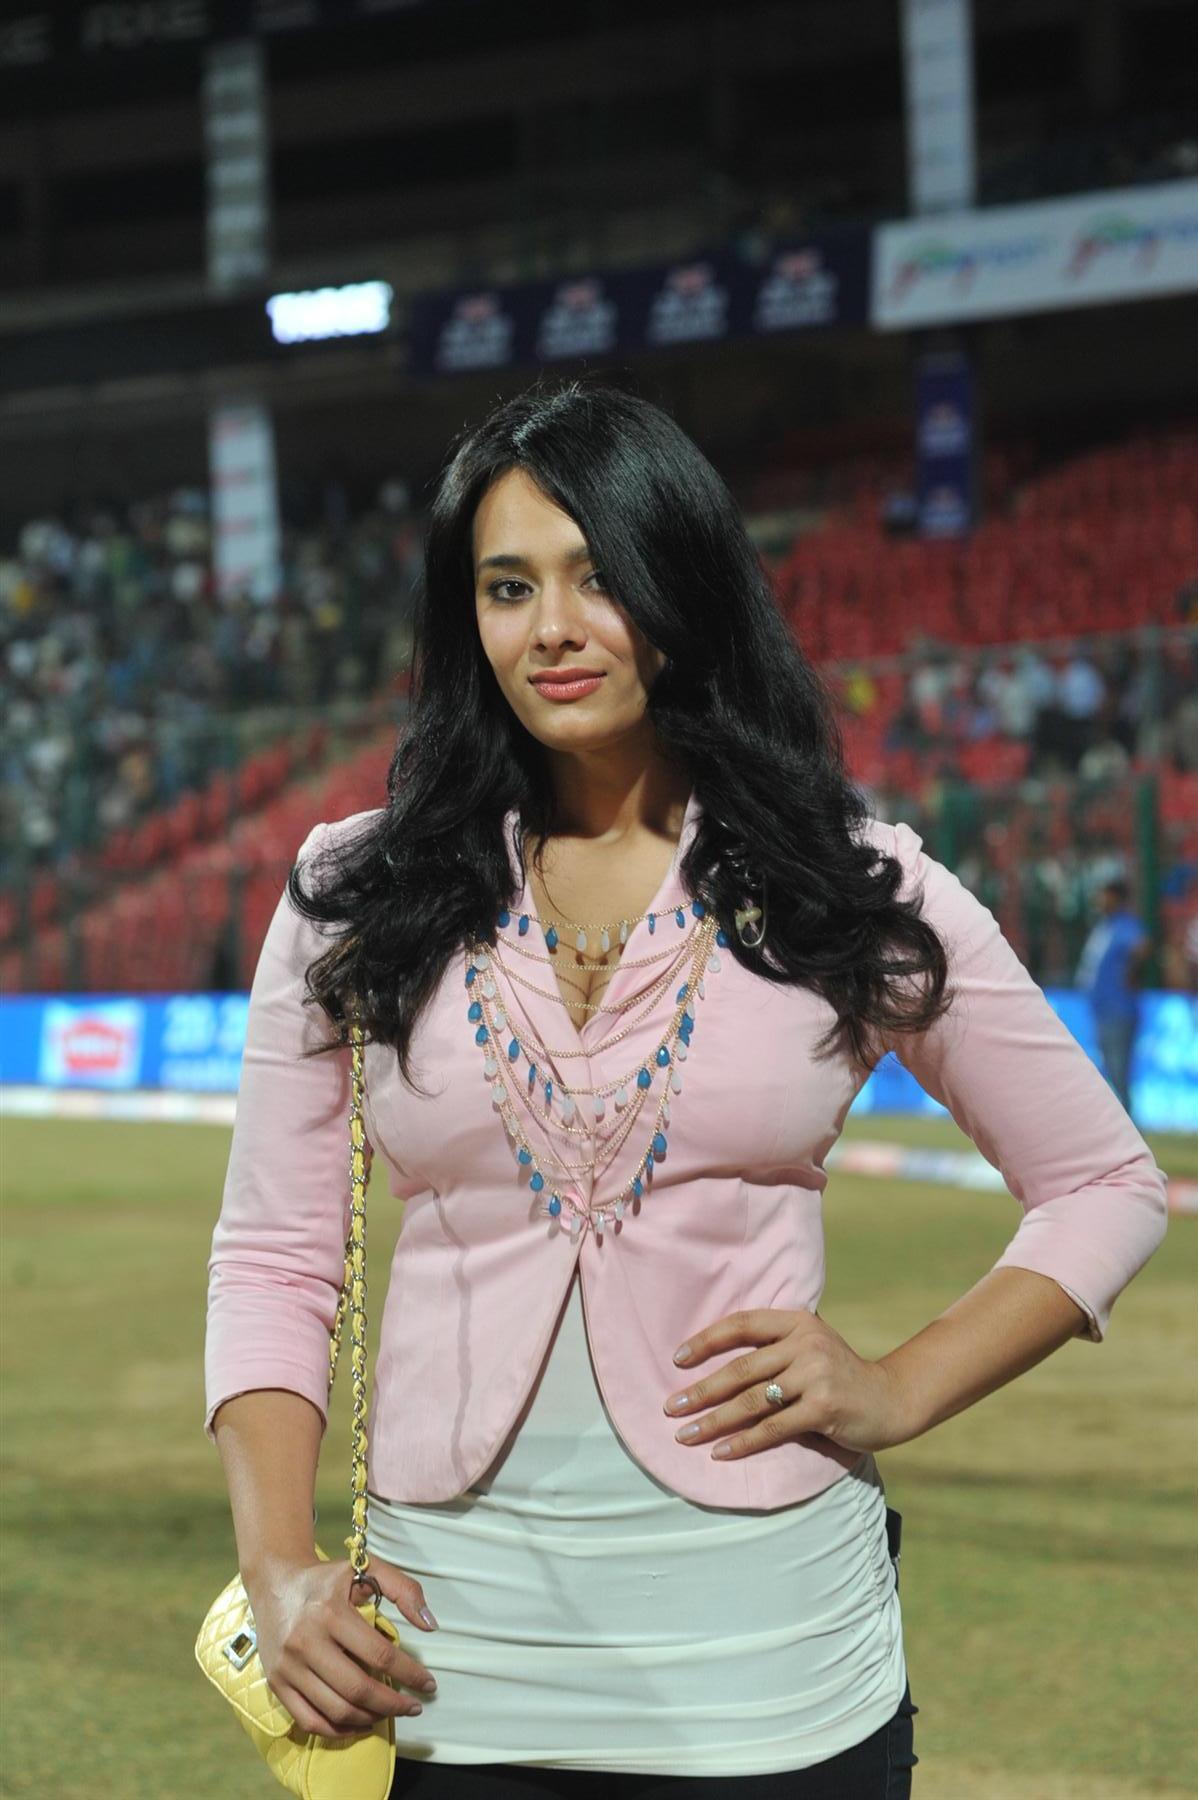 Mayanti Langer 25 Hottest Photos Of Sexiest Sports Journalist quotMayanti